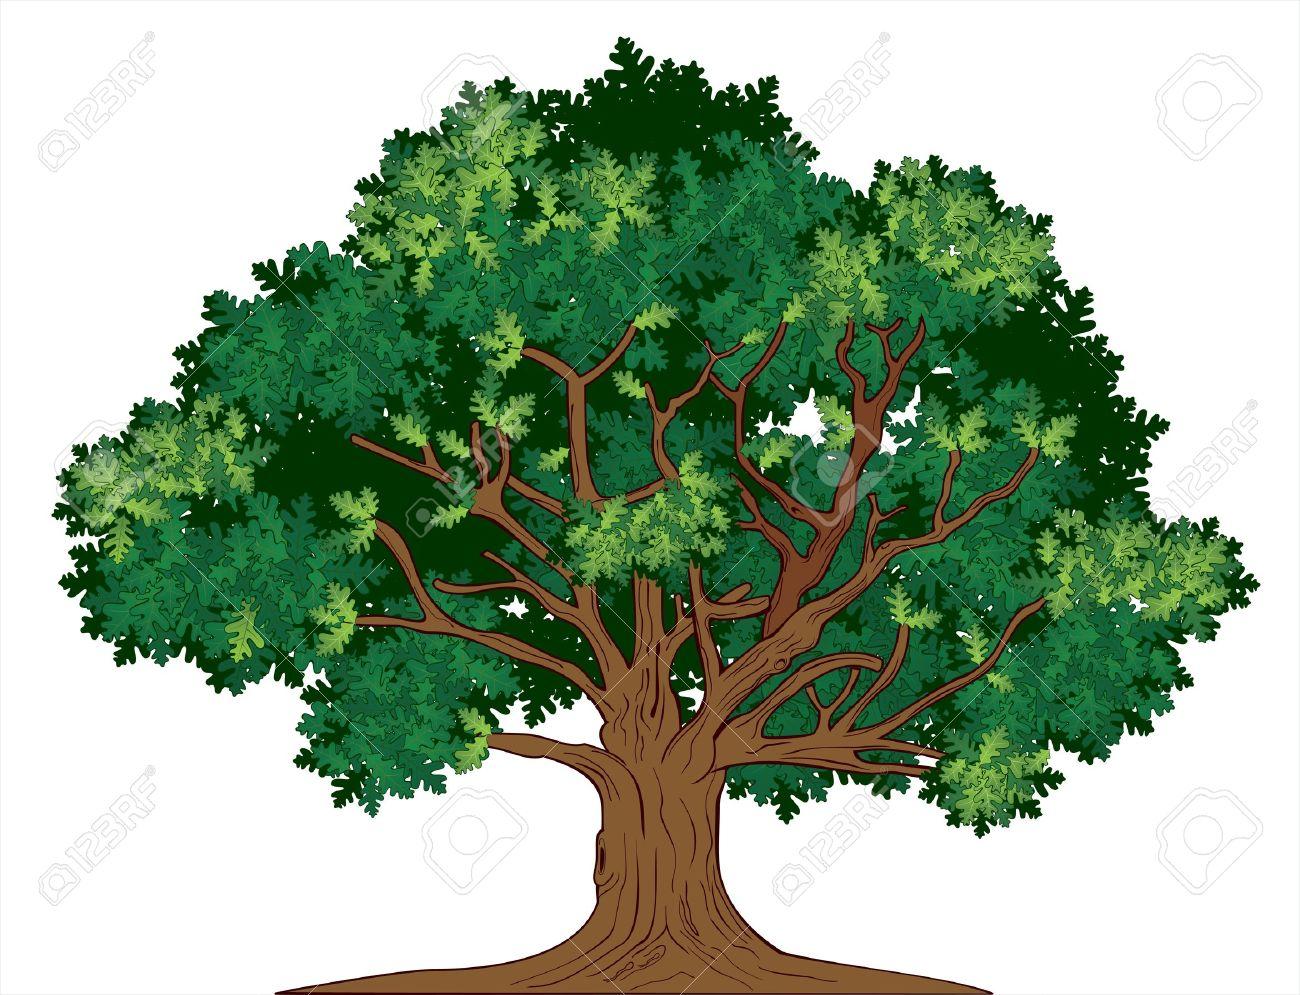 vector illustration of old green oak tree royalty free cliparts rh 123rf com oak tree vector download oak tree vector image